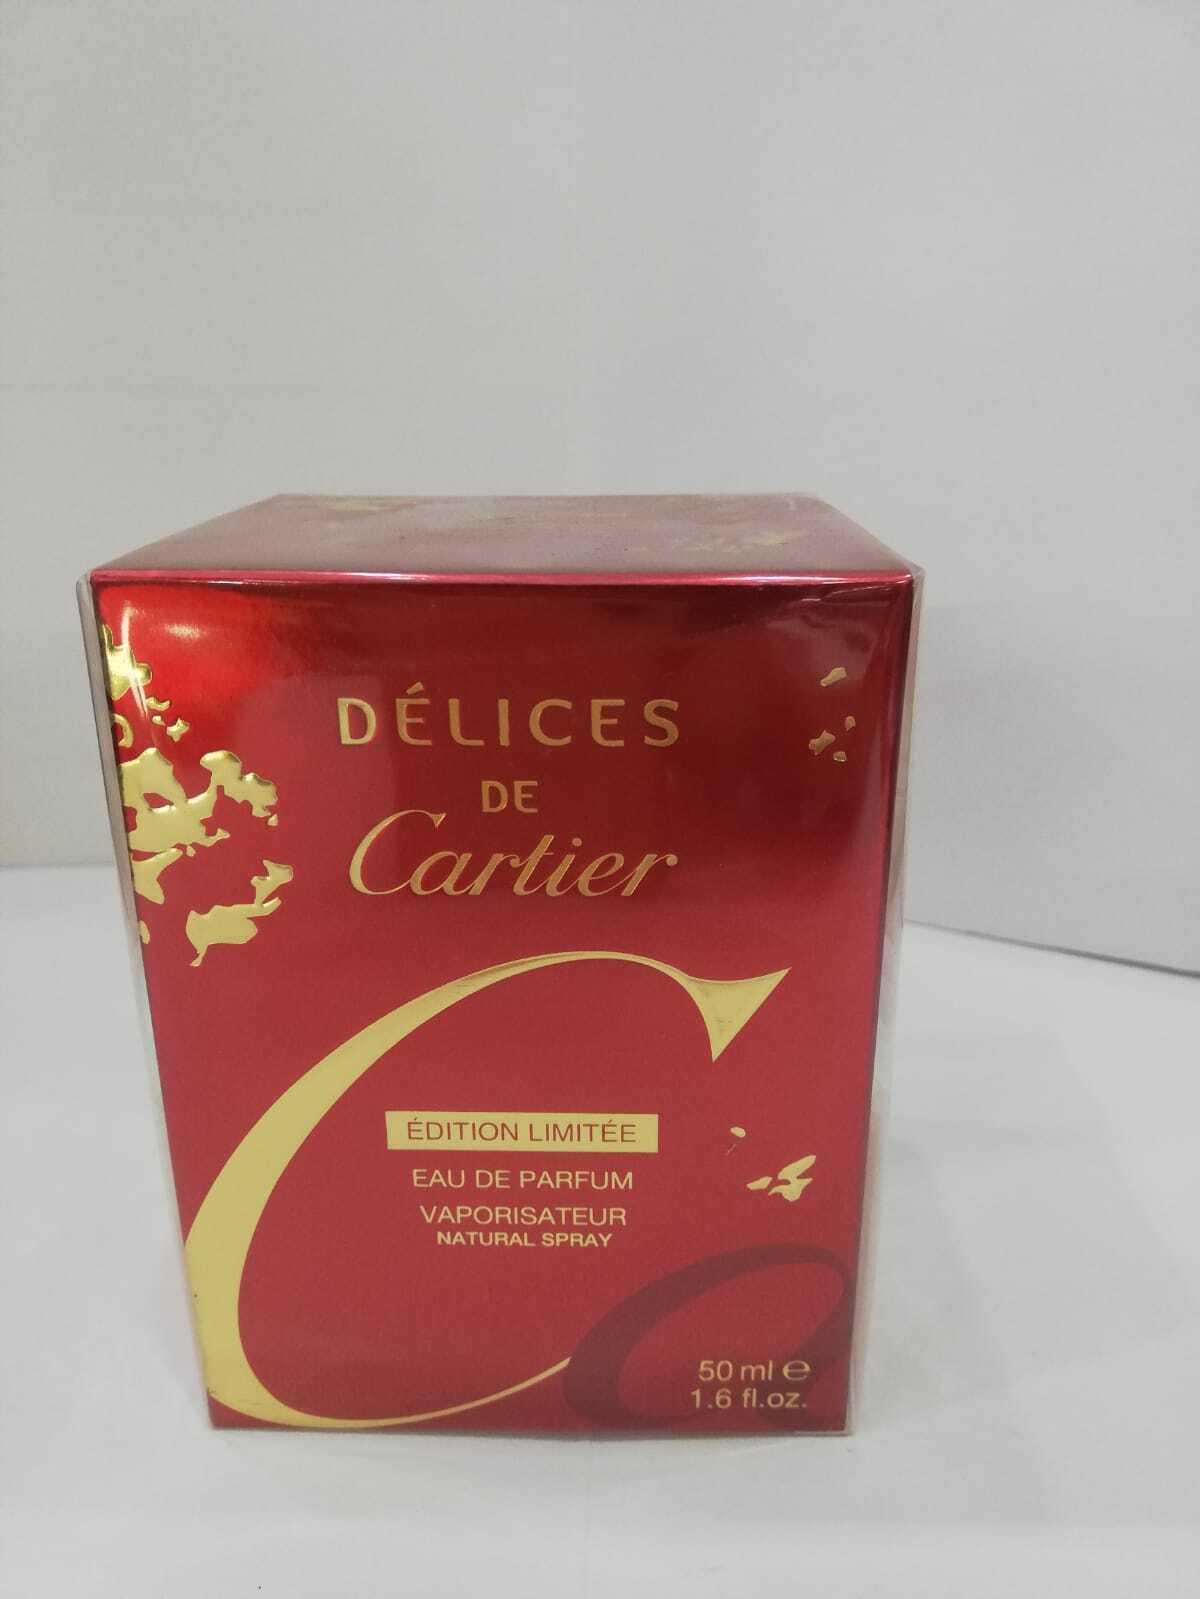 Cartier delices de cartier 1.6 oz perfume